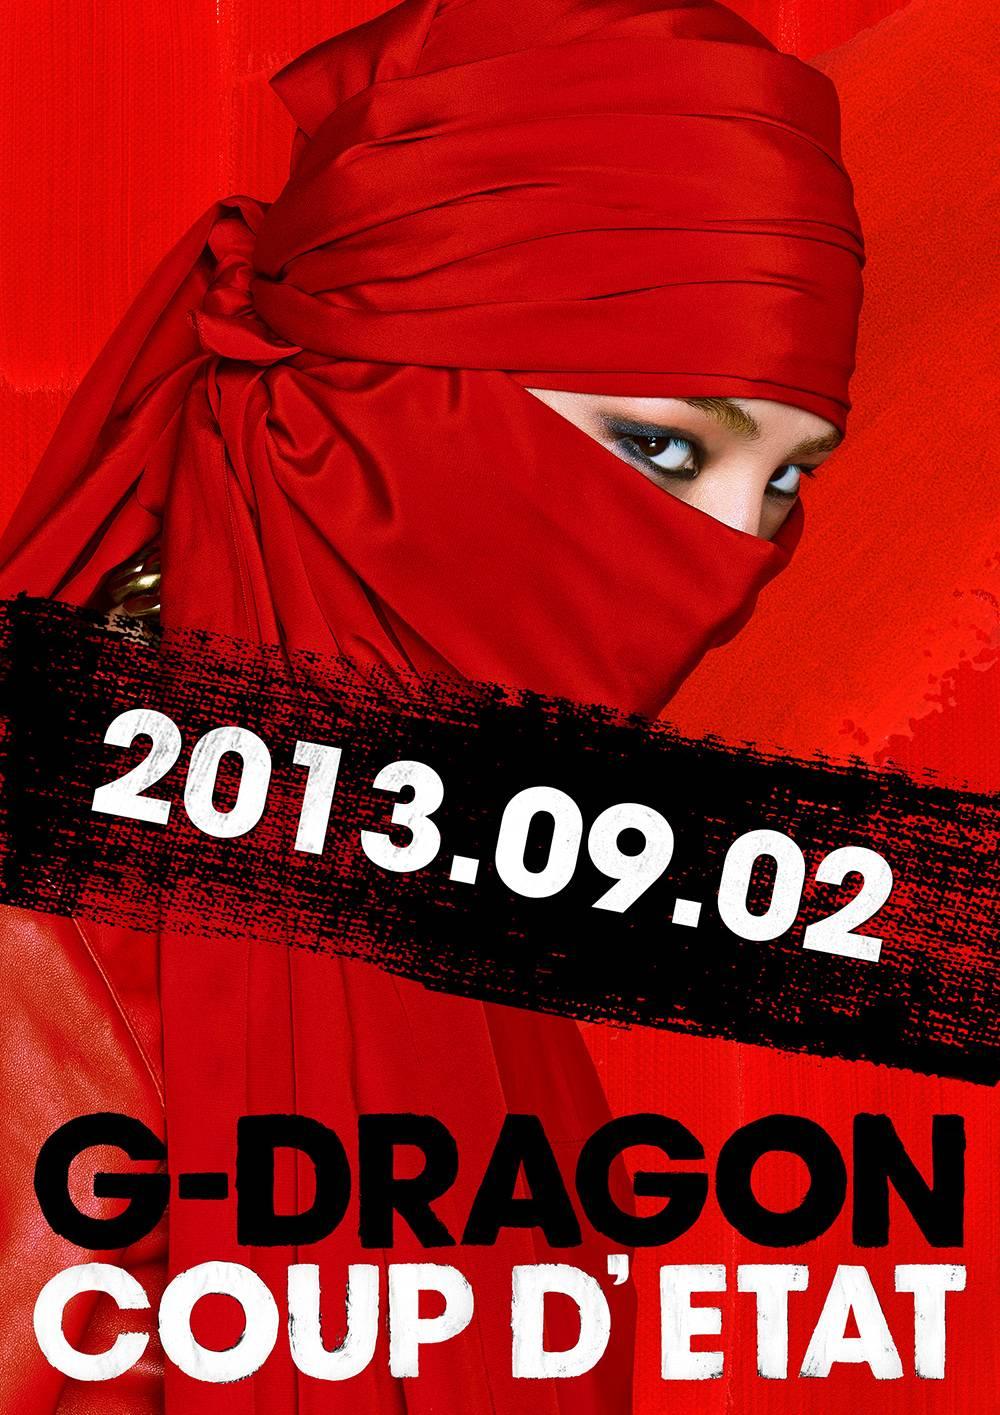 "G-Dragon เผยภาพทีเซอร์ที่ 2 สำหรับ ""Coup D'etat"""